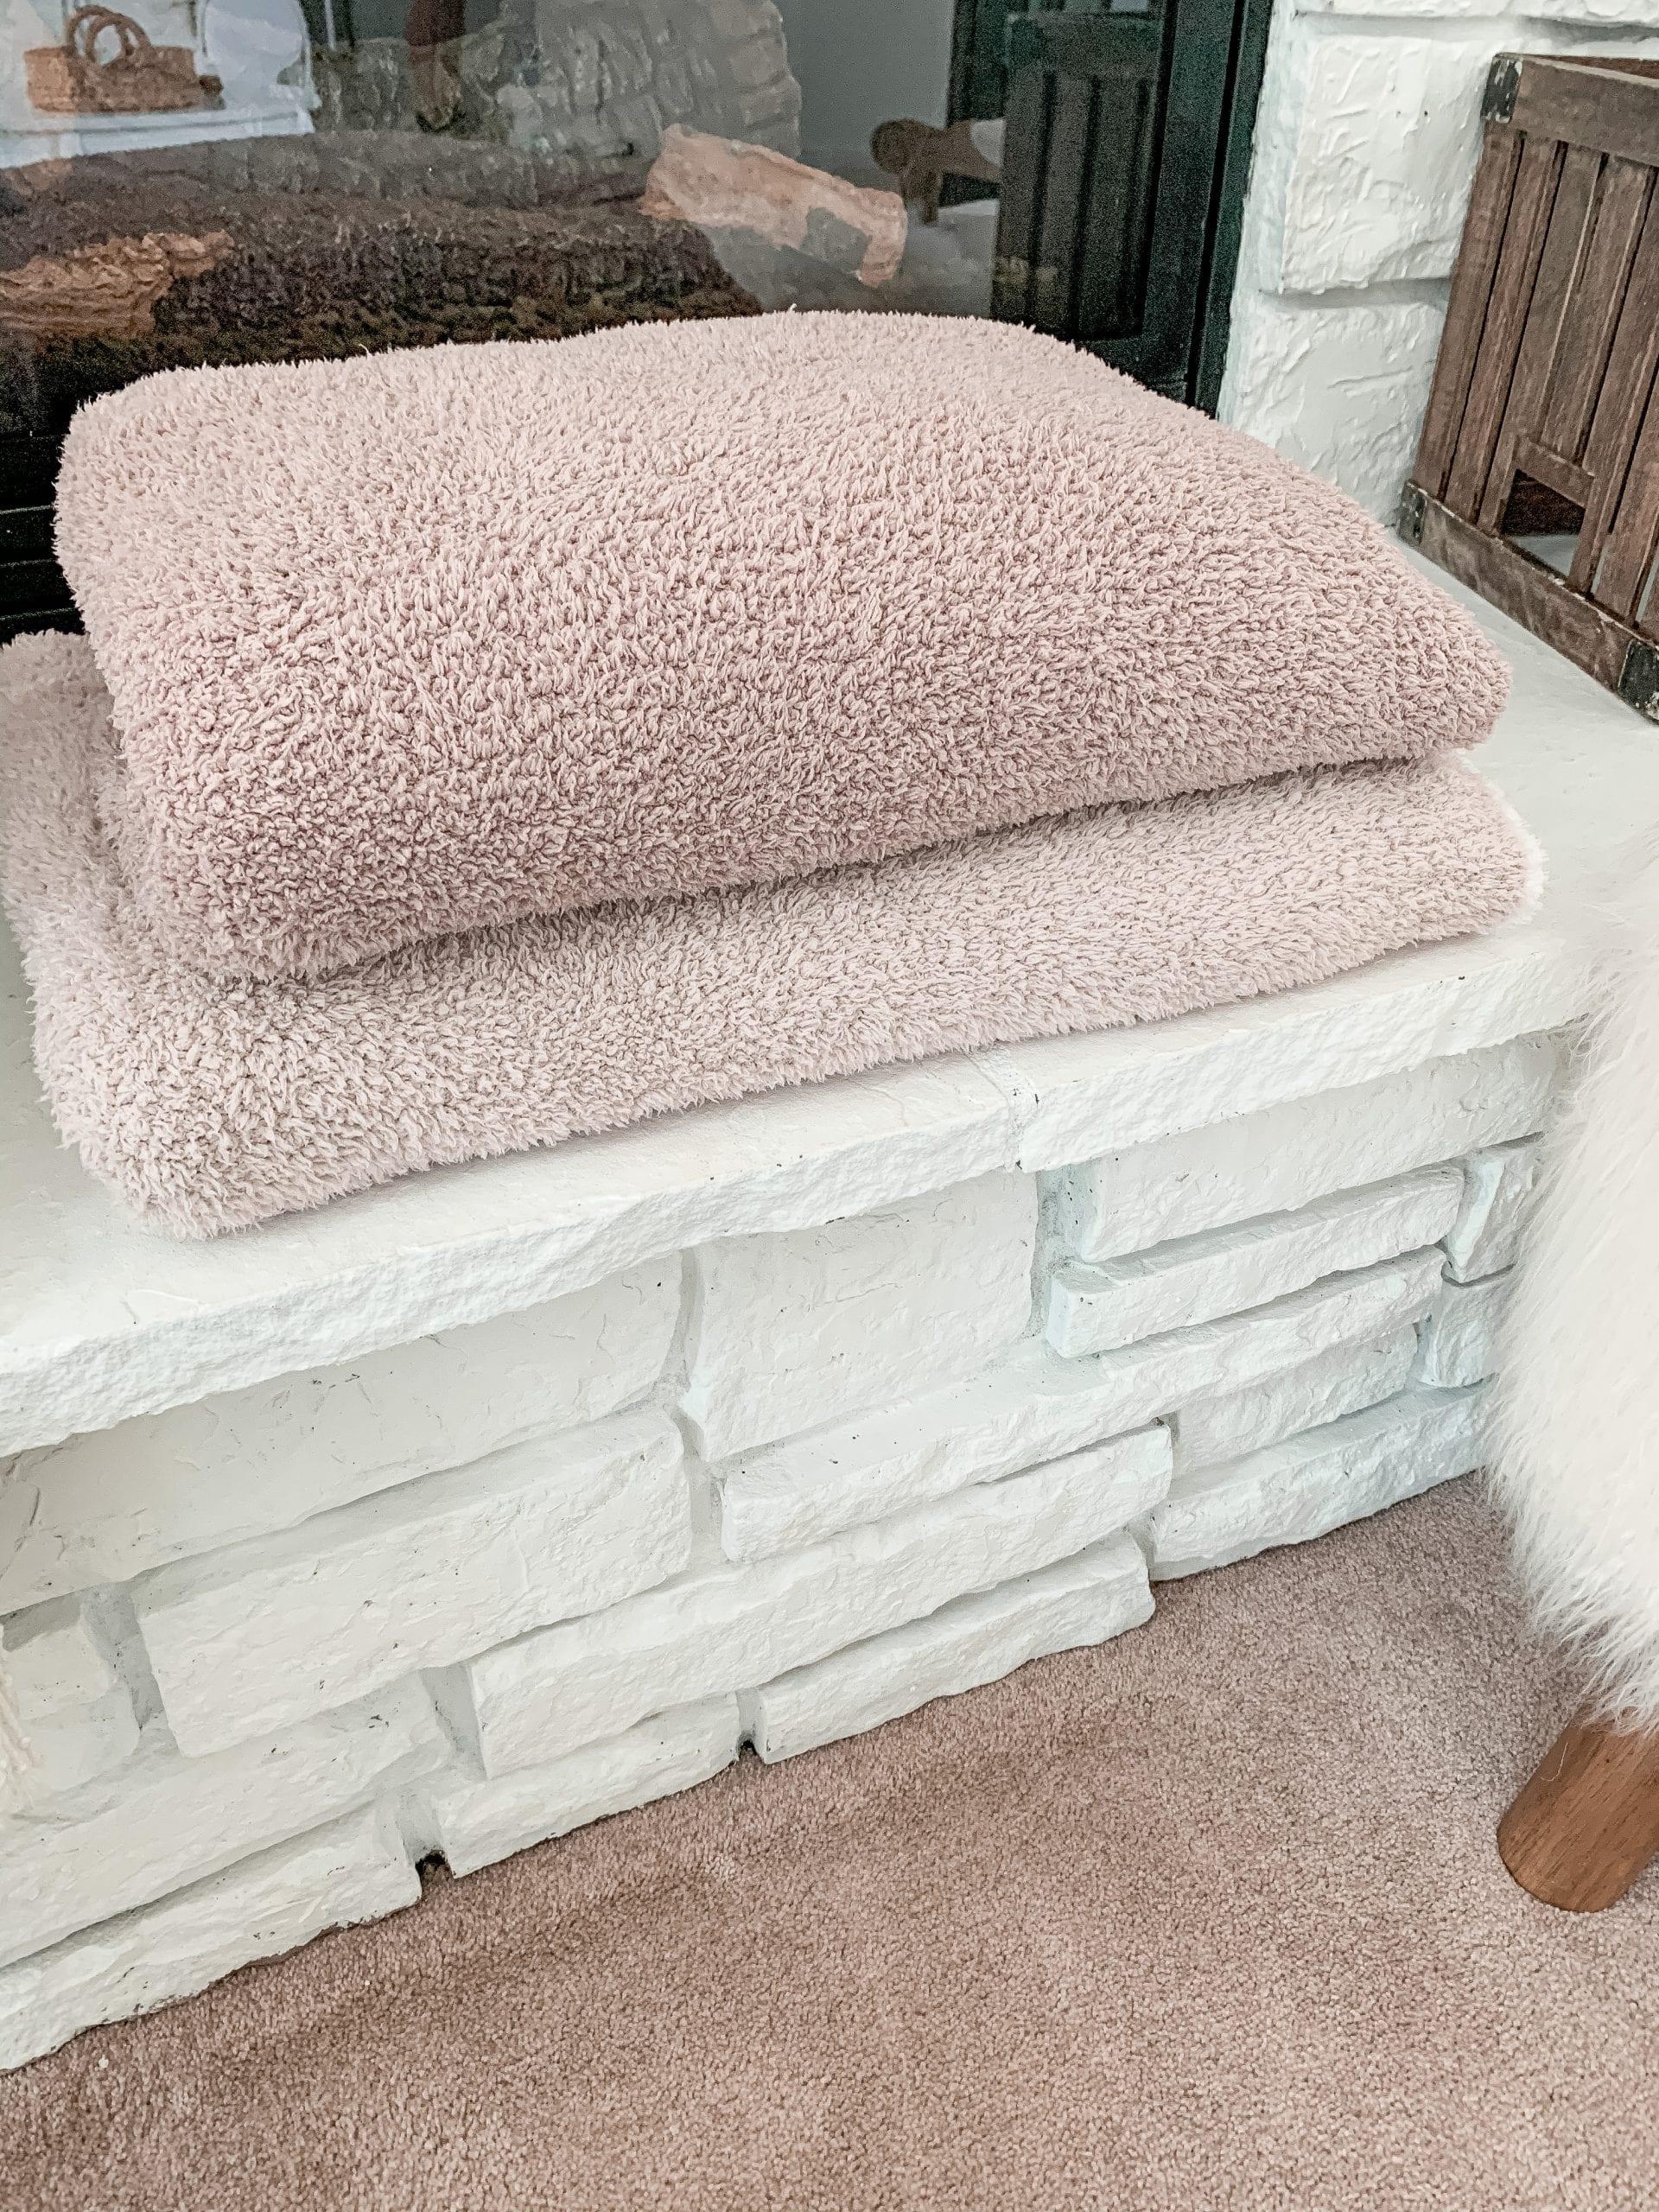 Anniversary Sale- Closet Staple Items- Fall Sale- Ashley Pletcher- Barefoot Dreams Cozy Chic Throw Blanket